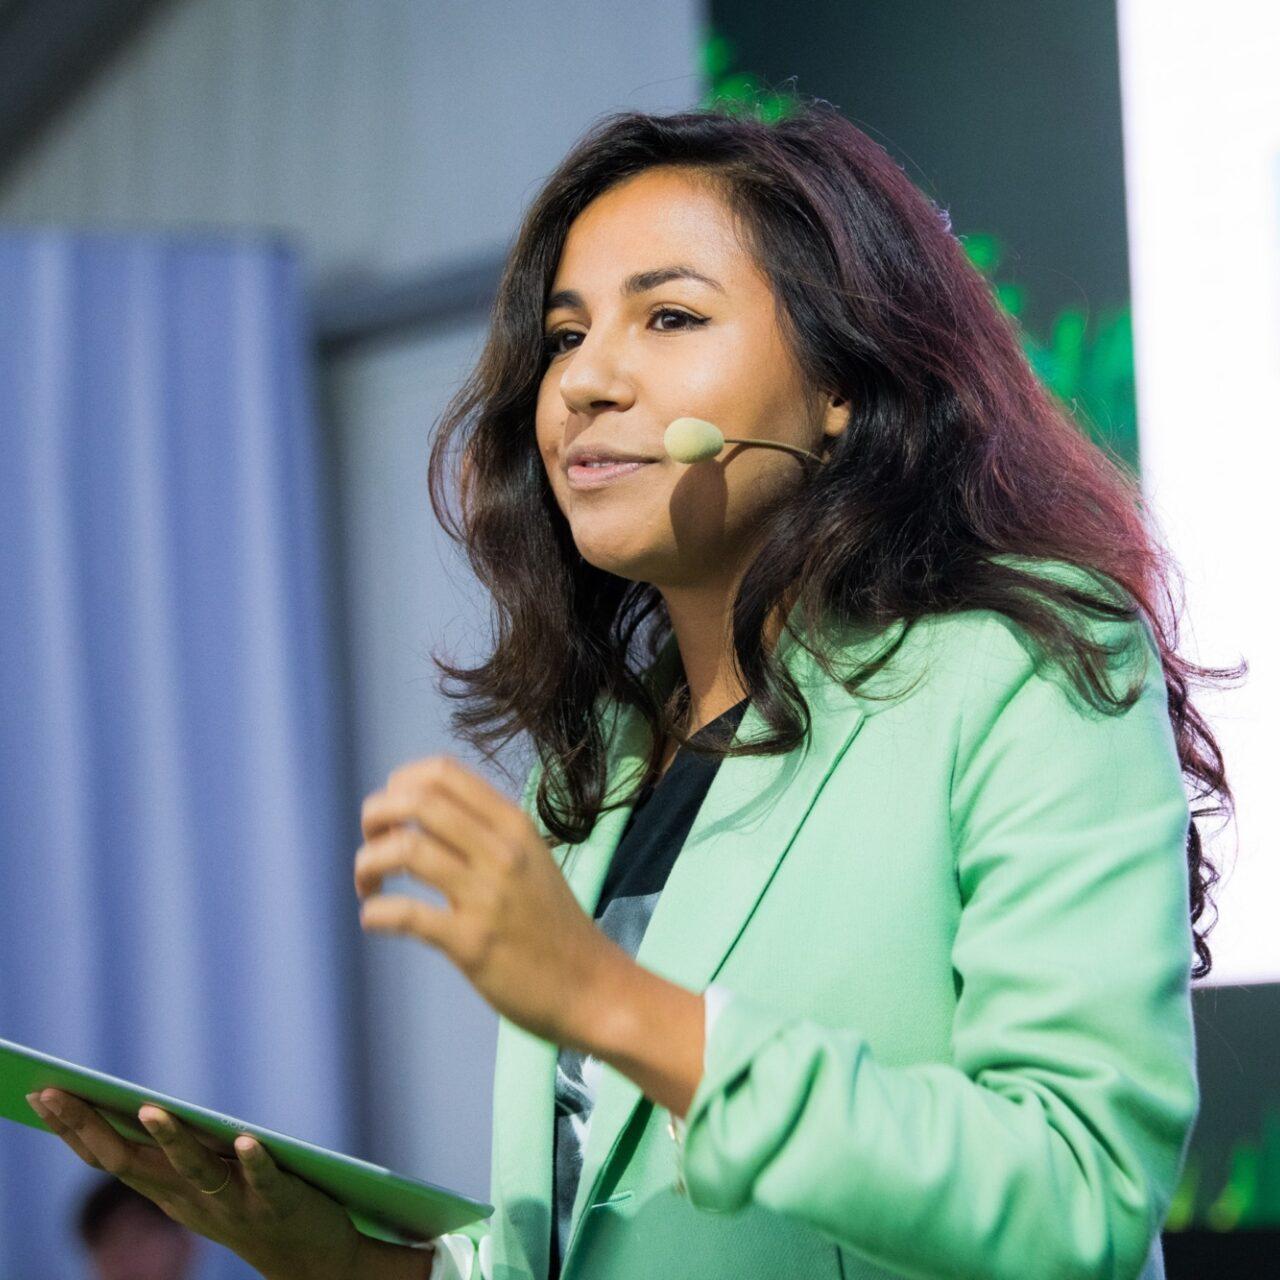 Talitha Muusse als spreker of dagvoorzitter